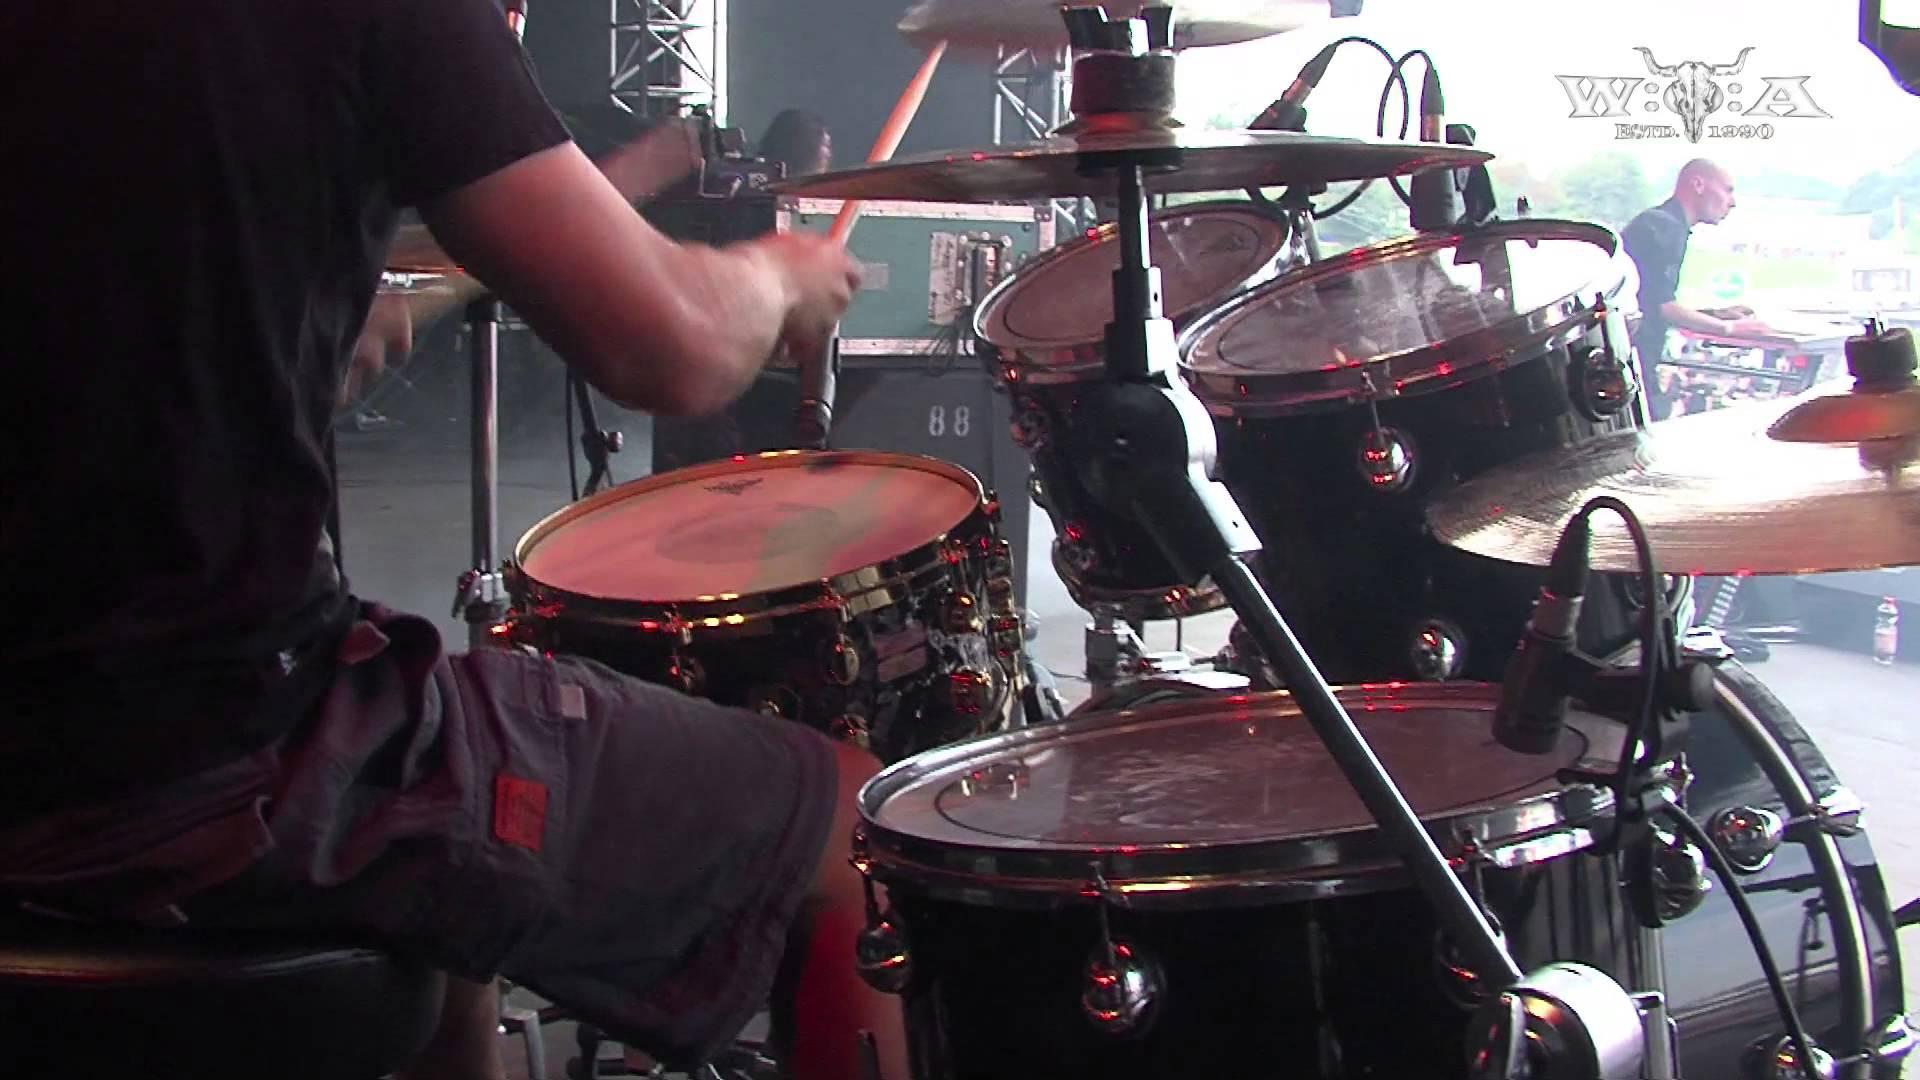 Visions of Atlantis - Full Show - Live at Wacken Open Air 2011